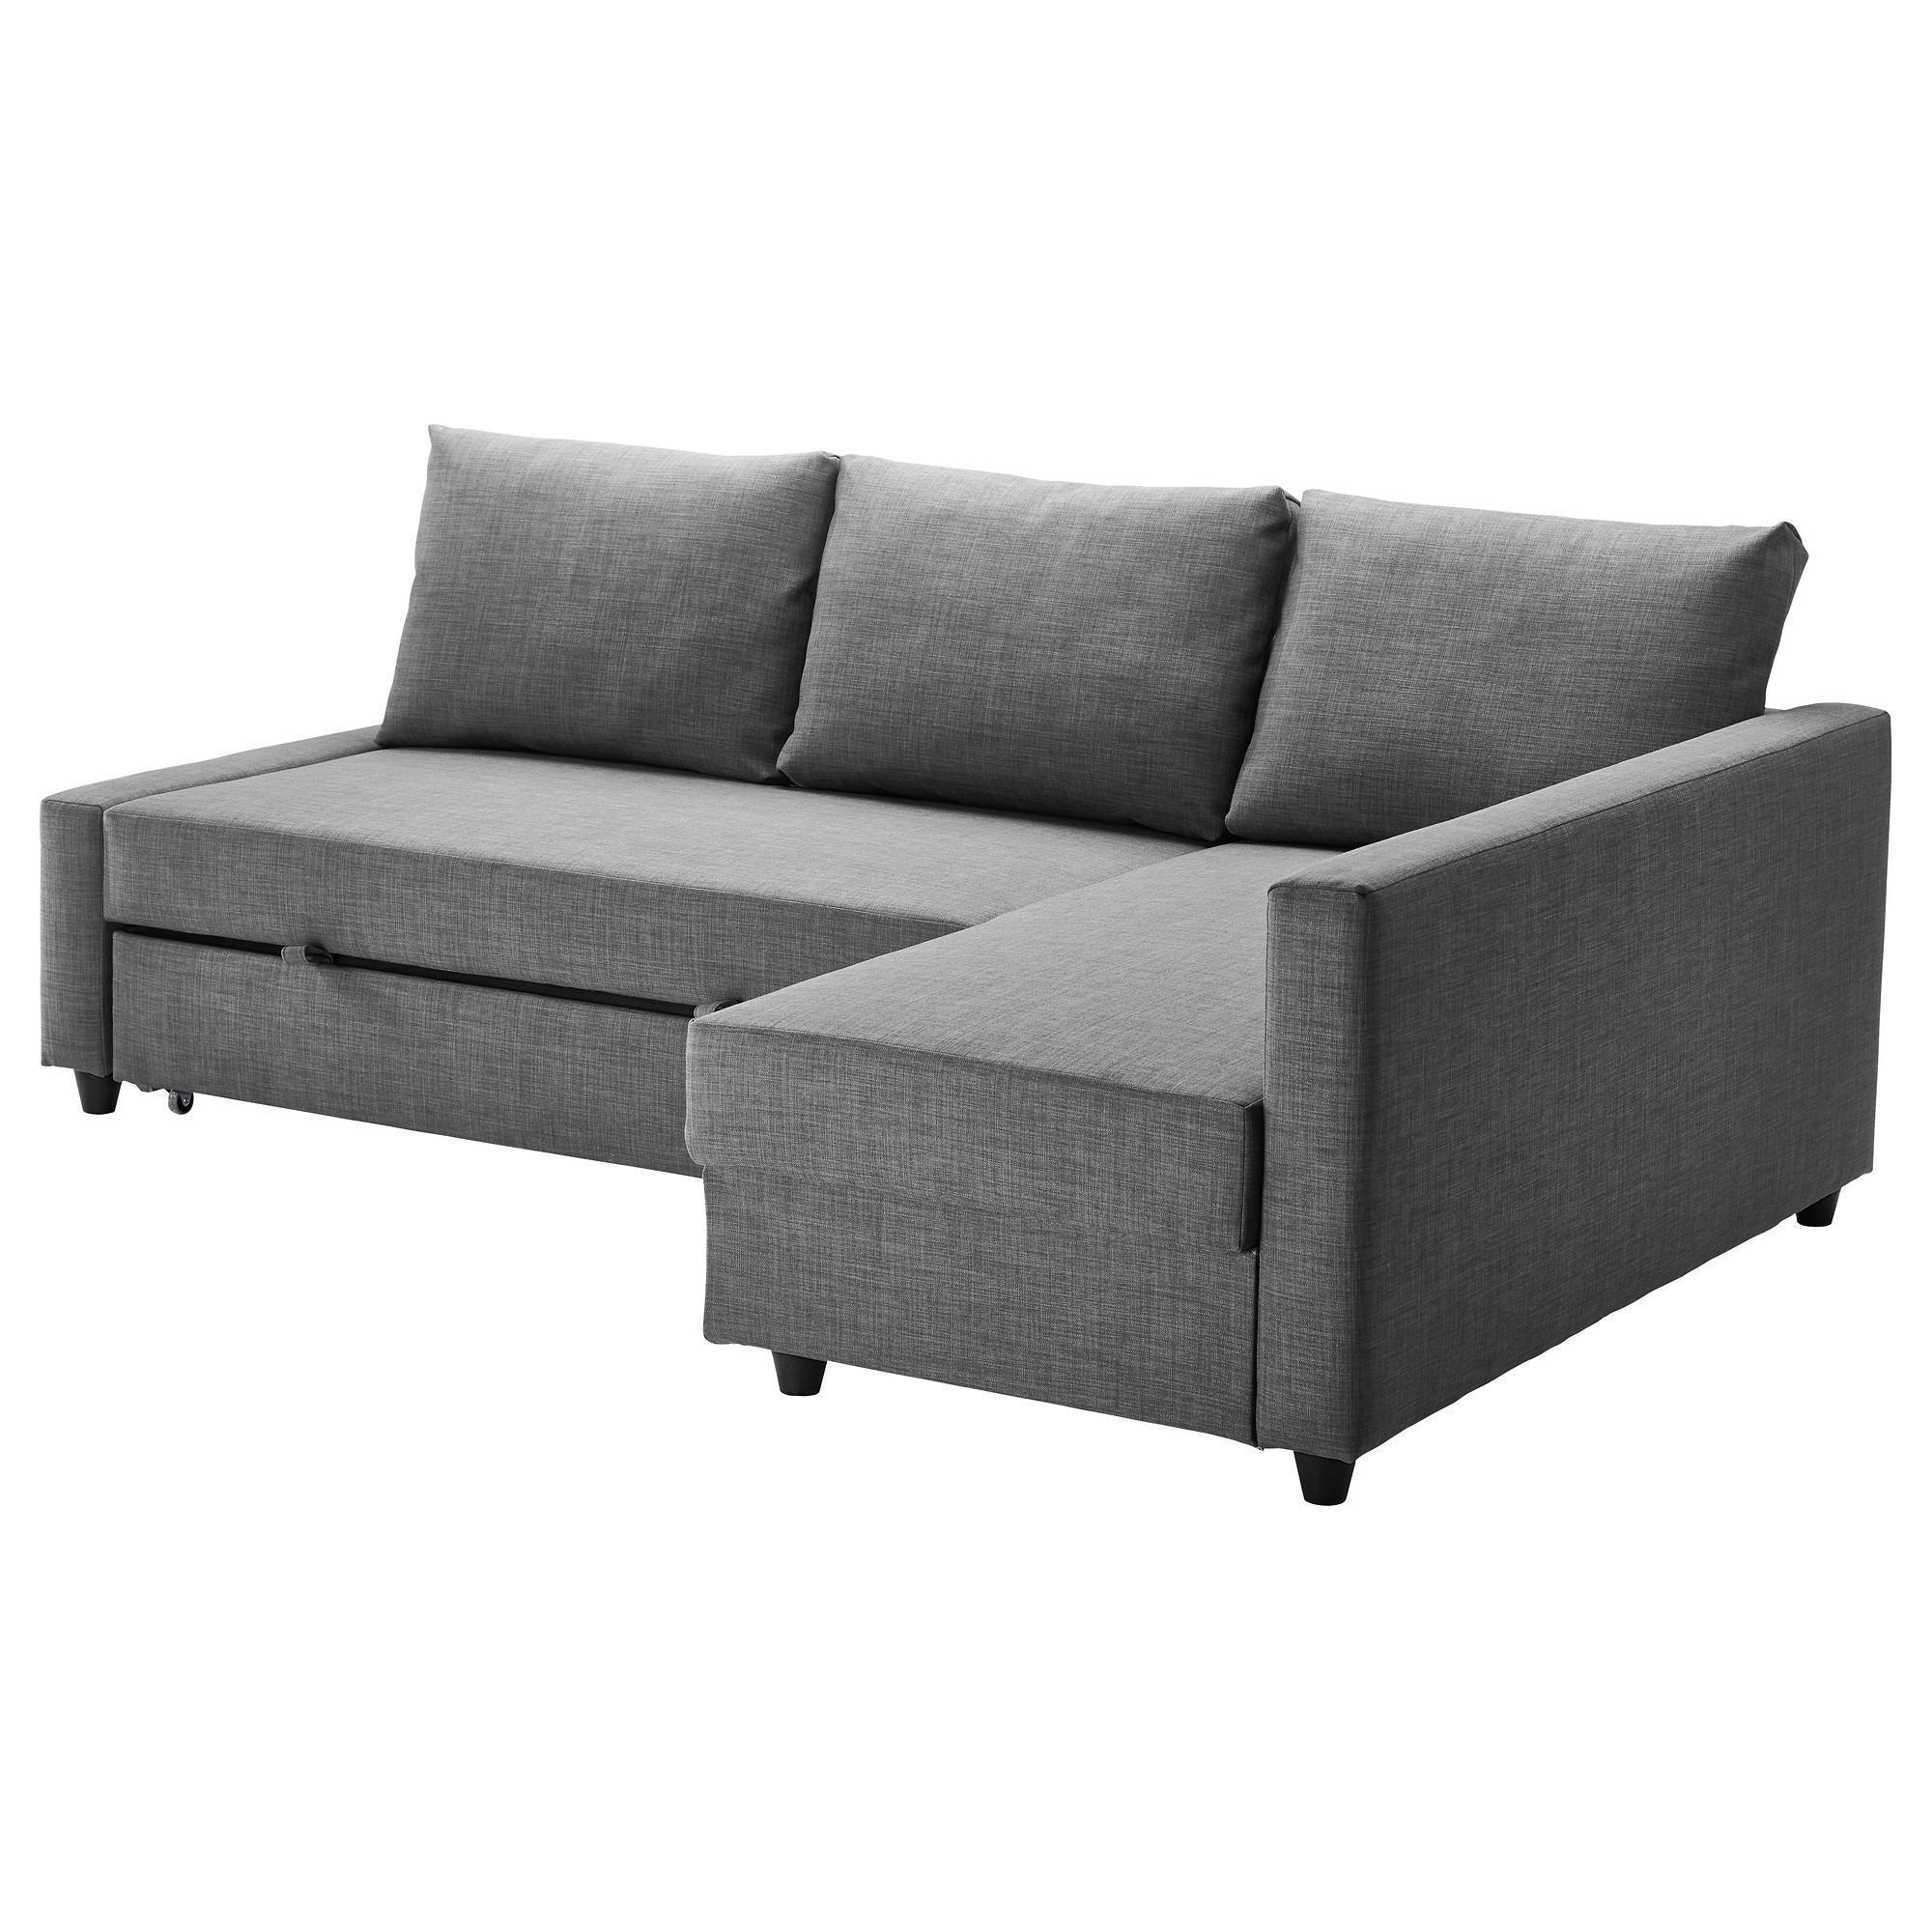 Friheten Corner Sofa Bed With Storage Skiftebo Dark Grey – Ikea For Manstad Sofa Bed Ikea (View 17 of 20)